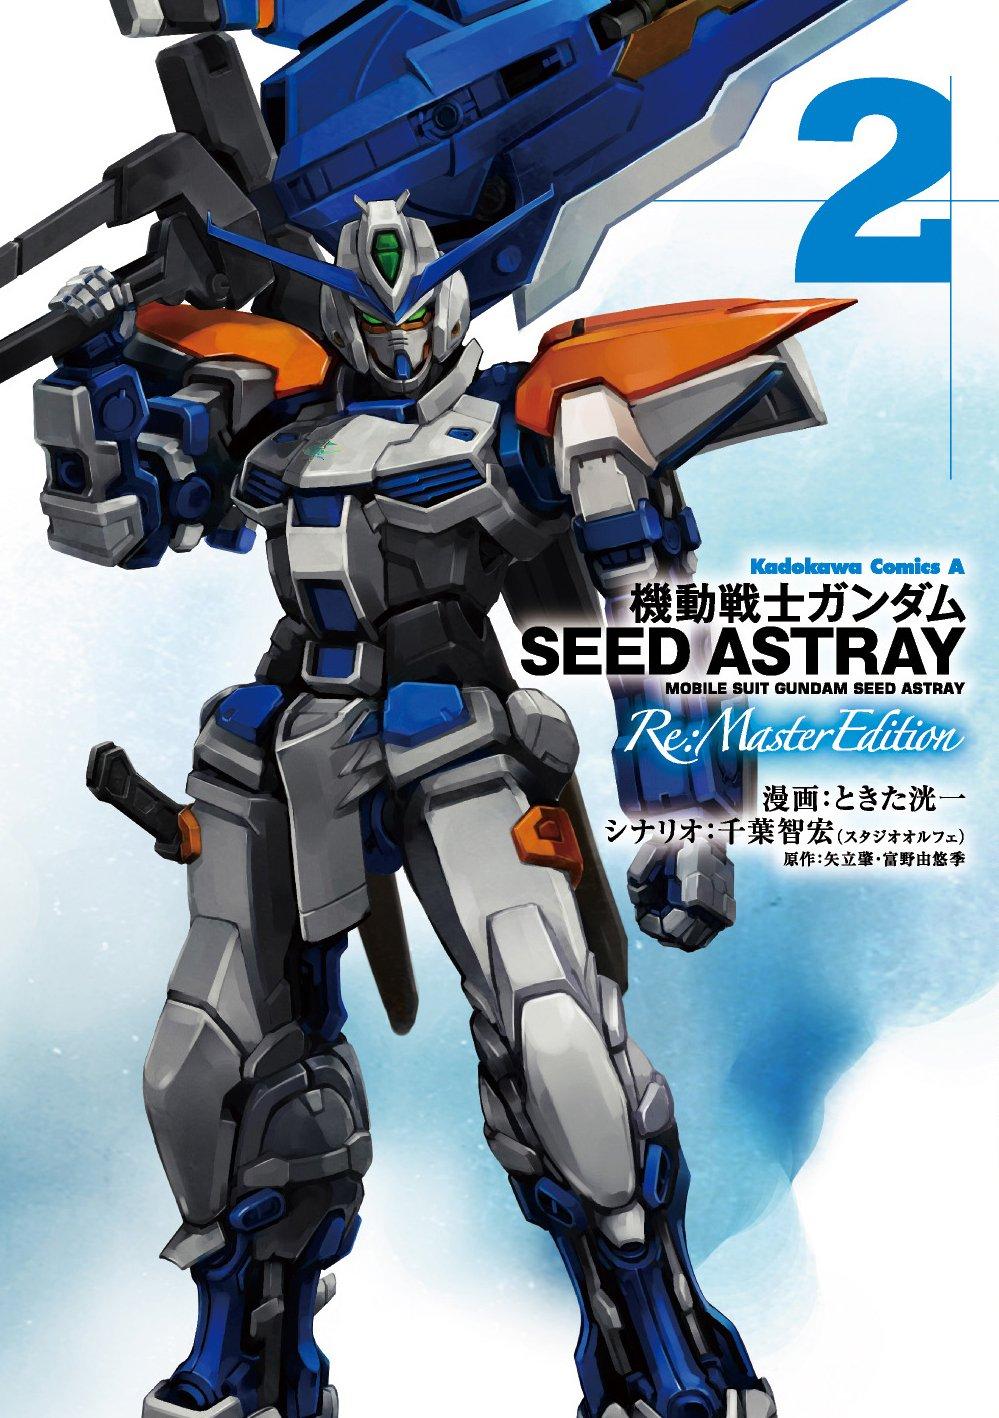 Gundam Seed Astray Wallpaper Seed Astray Remaster Edition 2